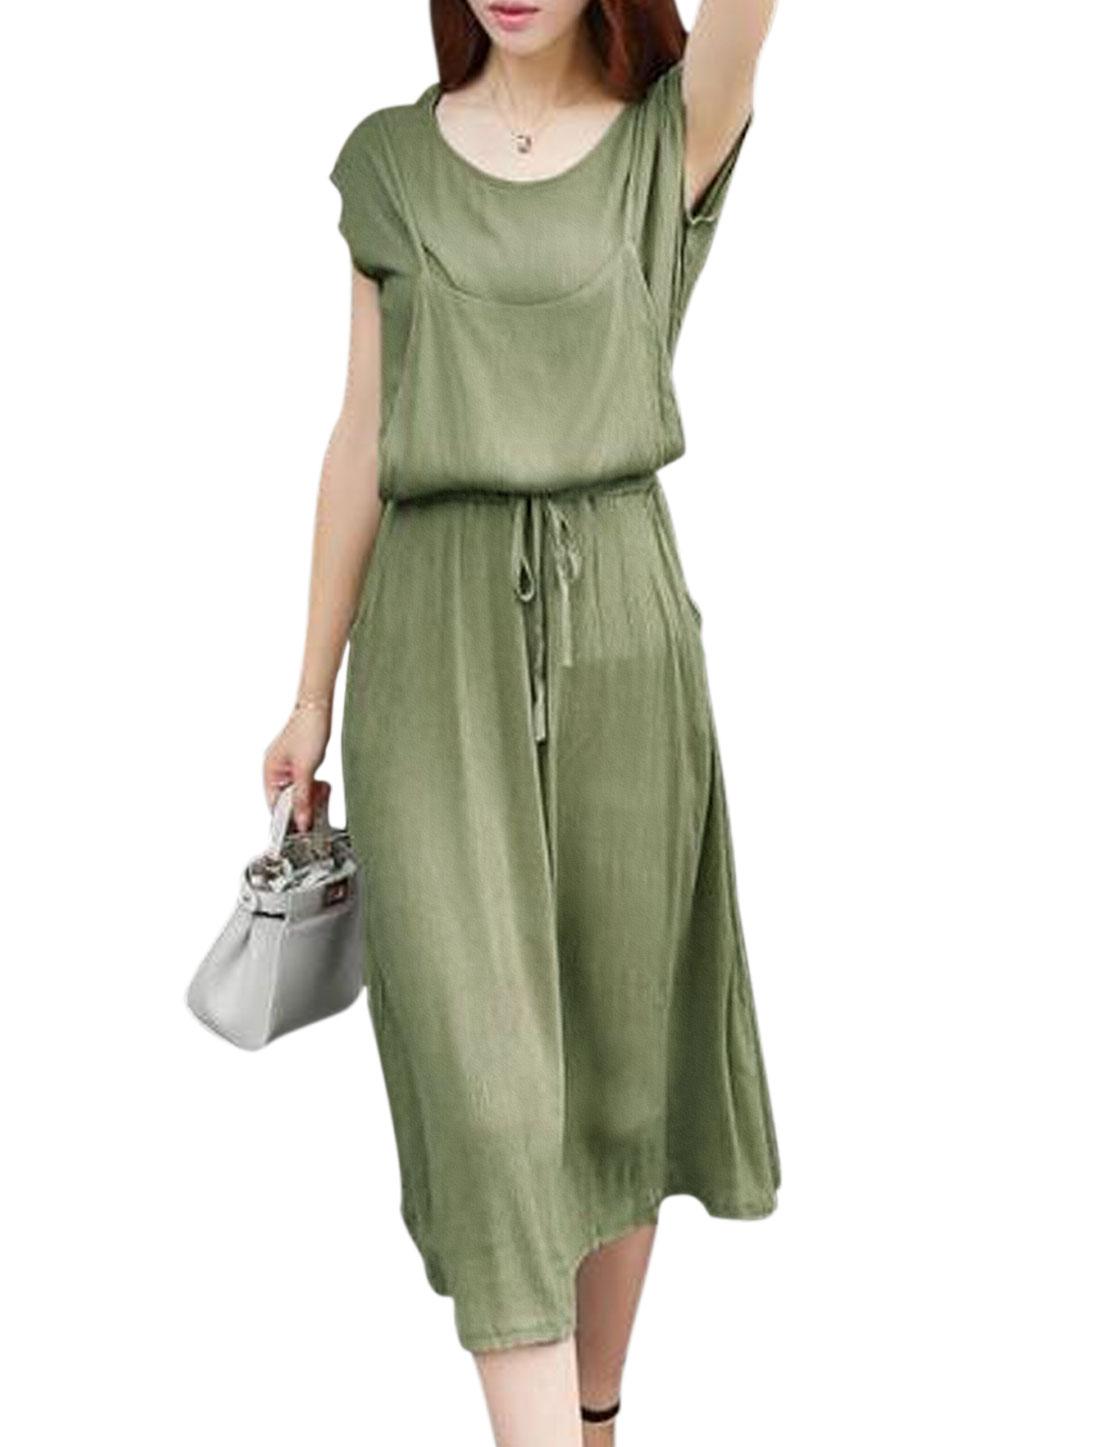 Lady Layered Drawstring Waist Short Sleeves Midi Dress Army Green S